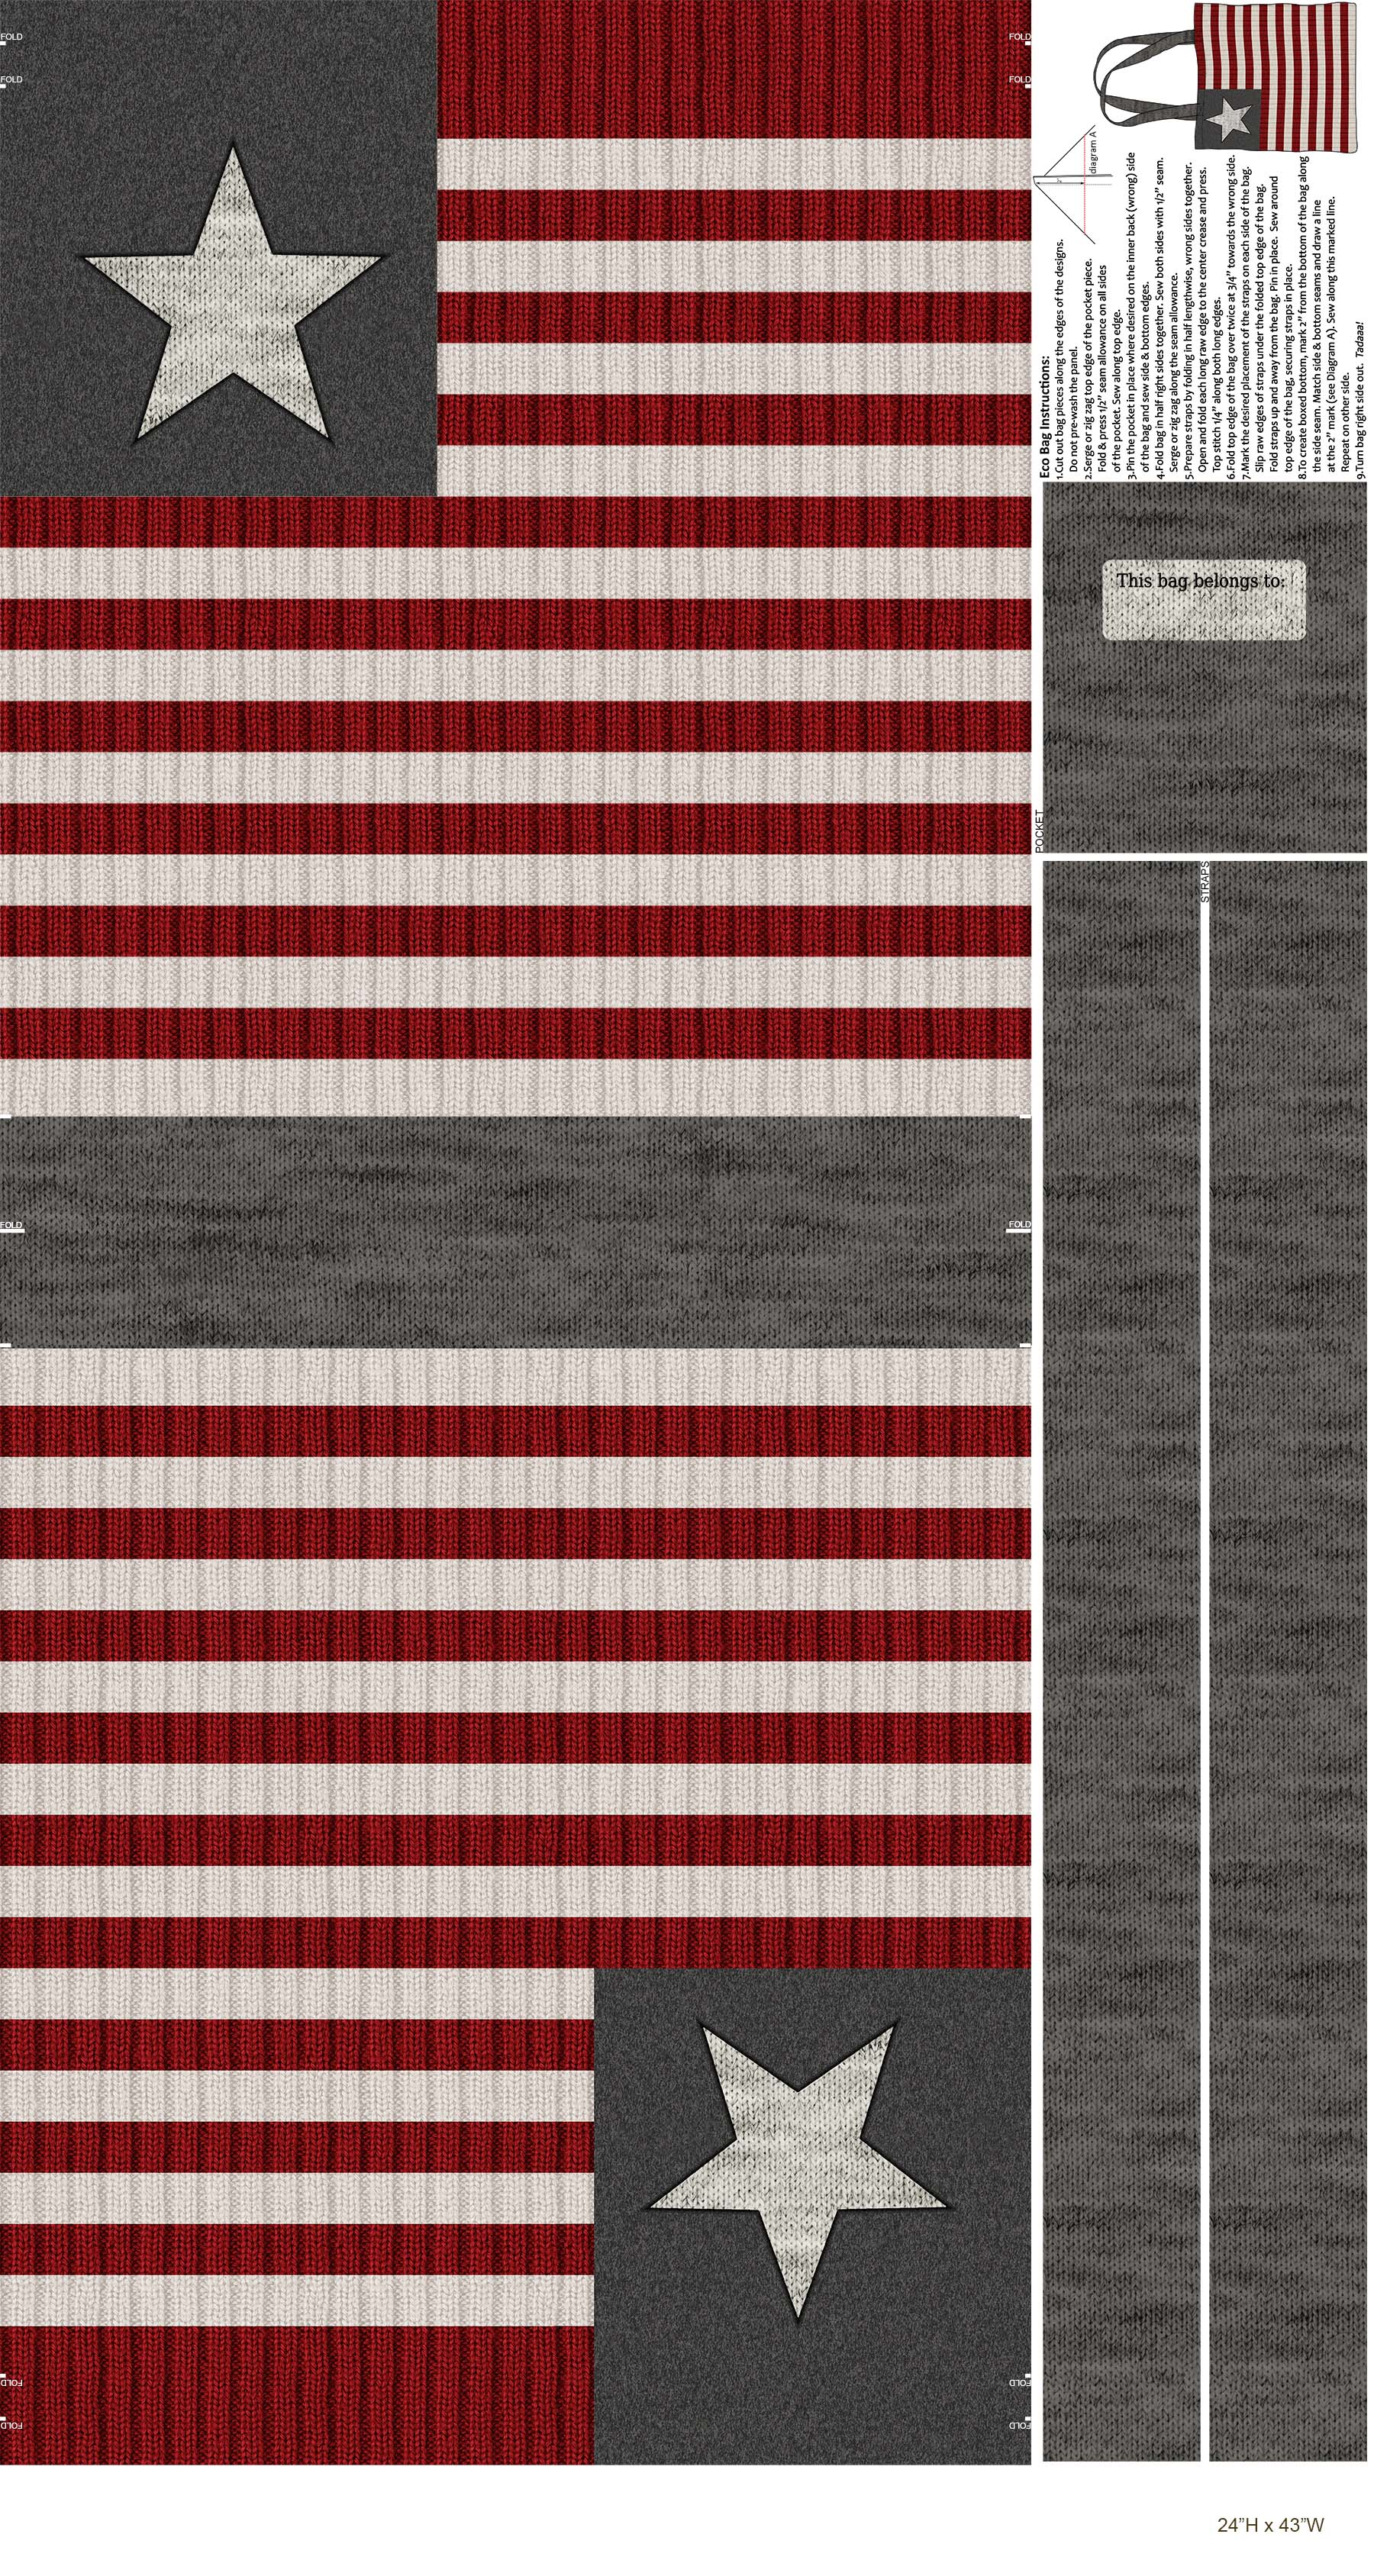 Canvas Panel - My America 43 X 24 w/ Bag Instructions